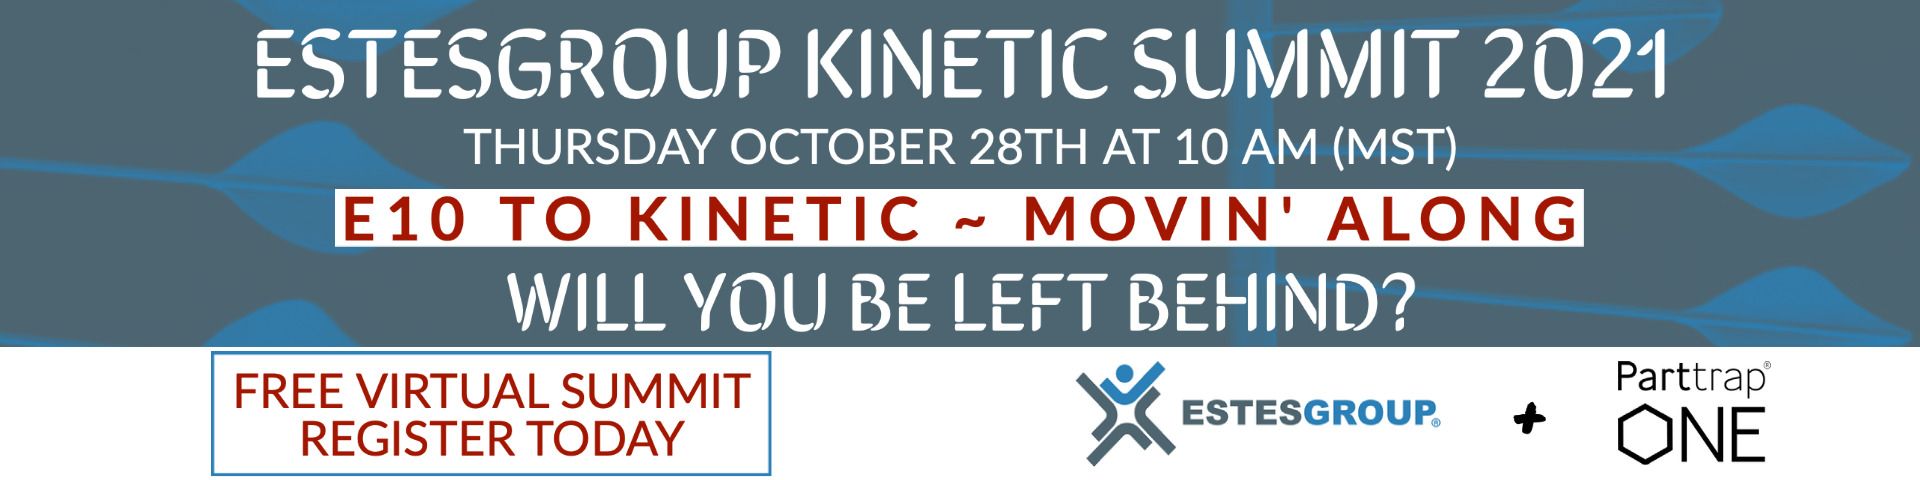 Epicor Kinetic Summit Fall 2021